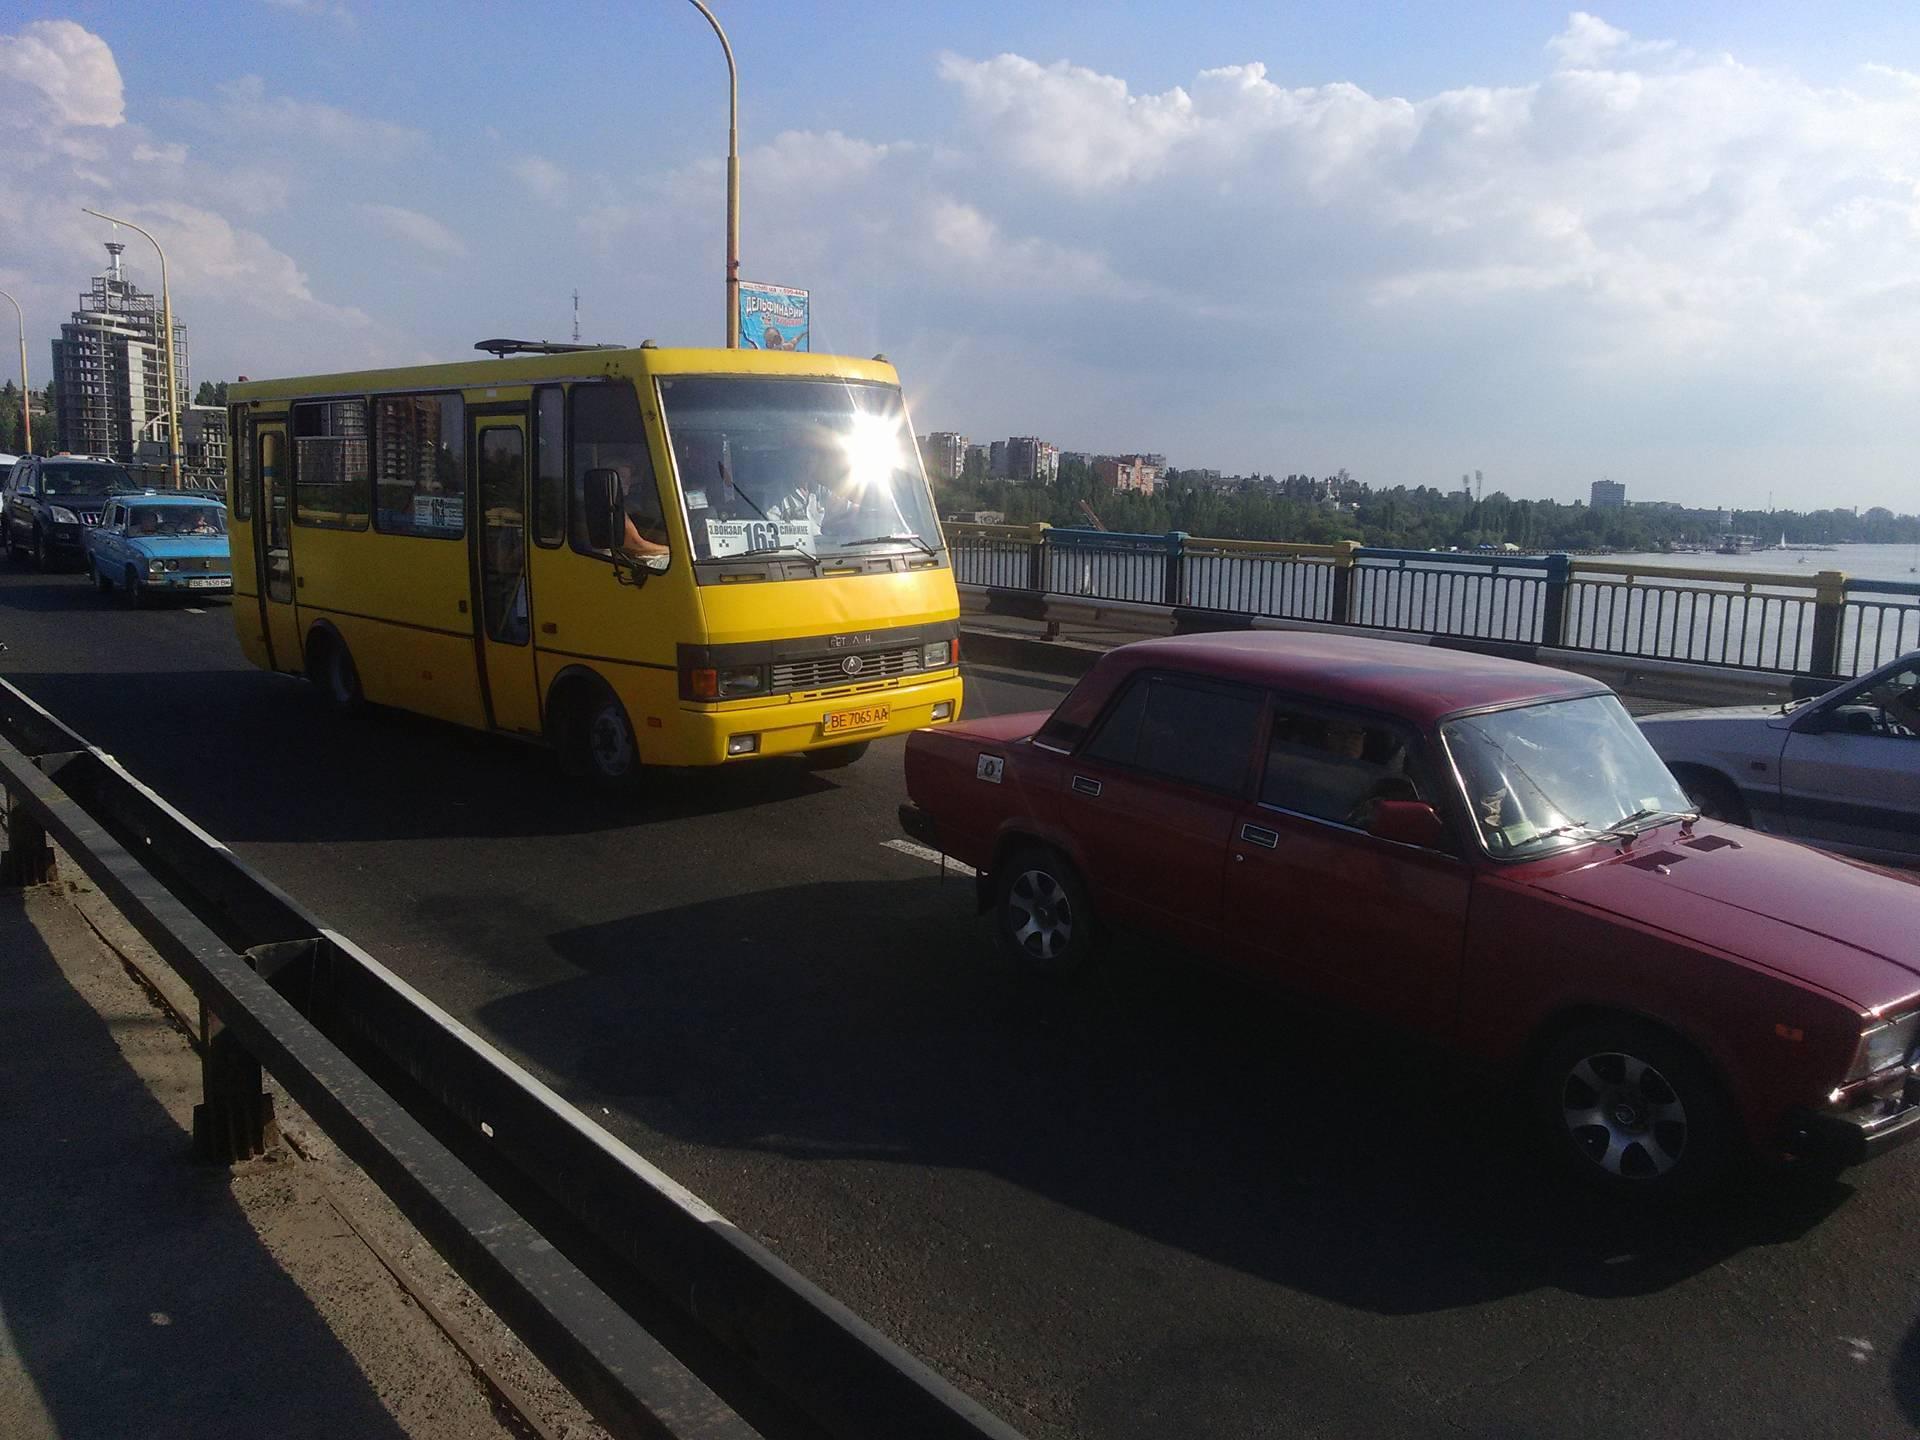 У Миколаєві на мосту в ДТП потрапили чотири машини: розтягнувся затор